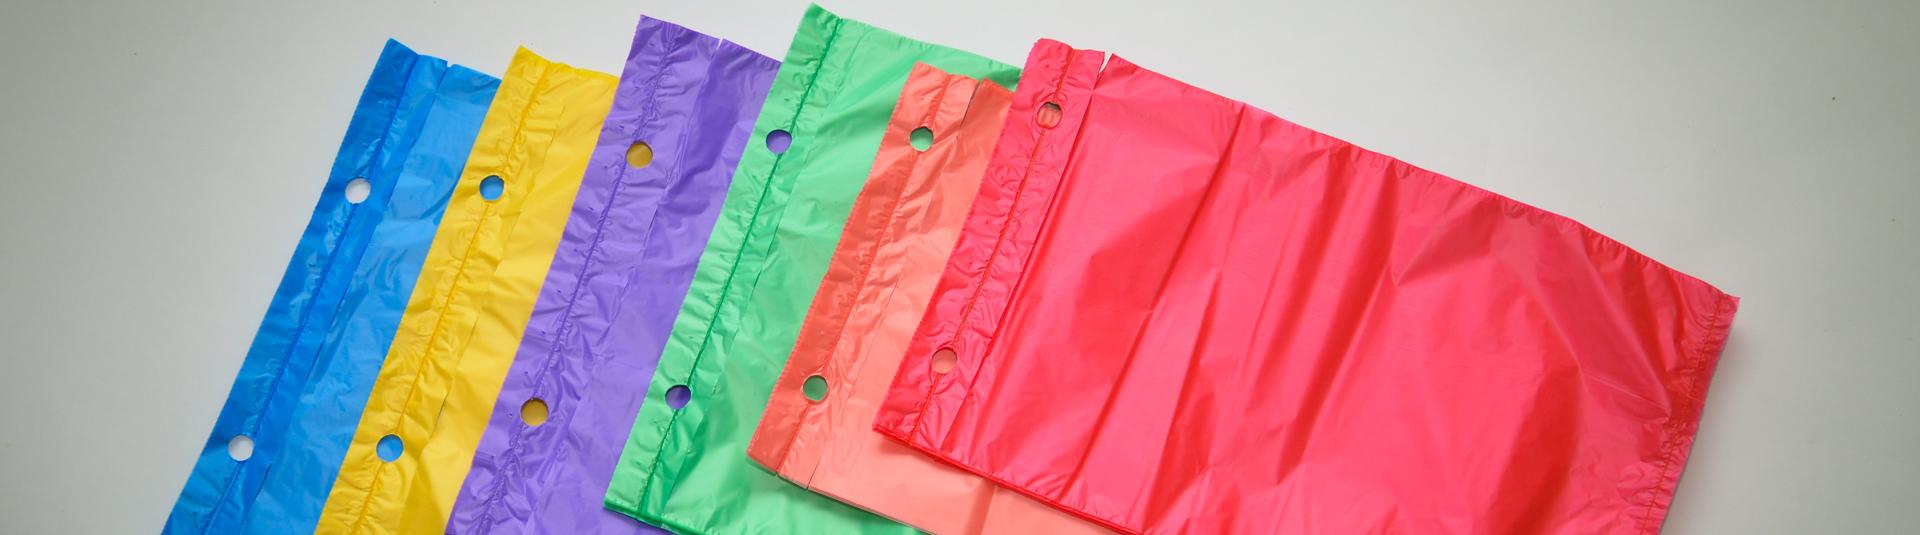 0b8a7456bd2 HDPE Films MIKROTEN®   Bags